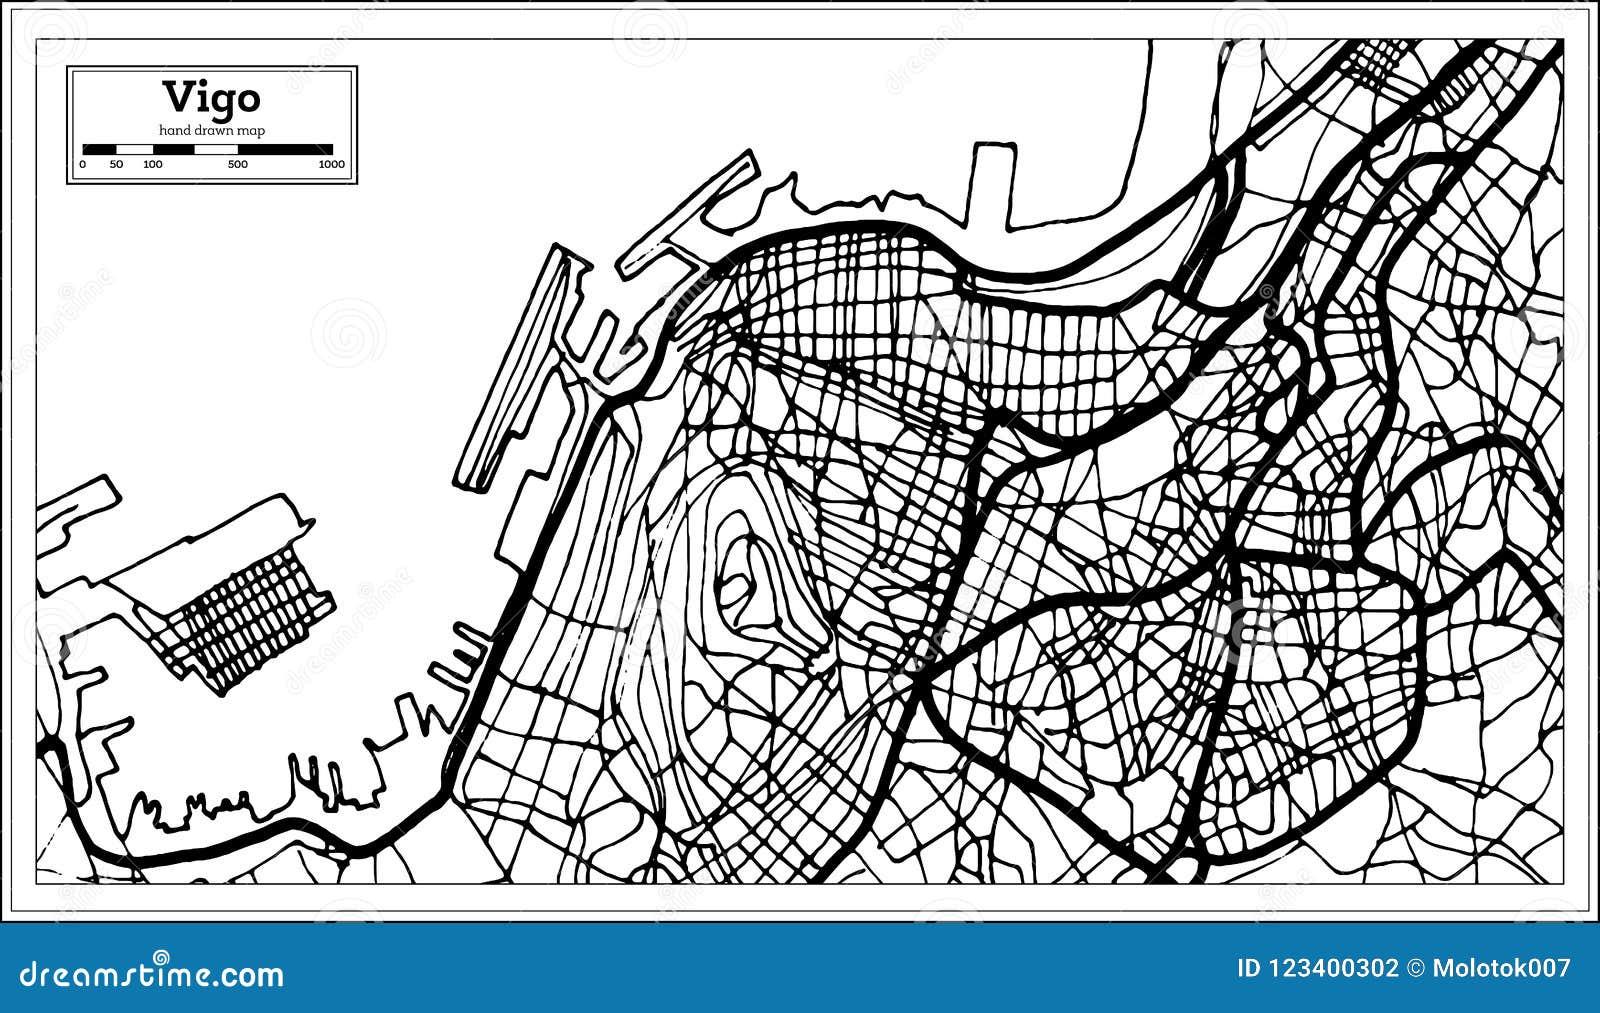 Map Of Spain Vigo.Vigo Spain City Map In Retro Style Outline Map Stock Vector